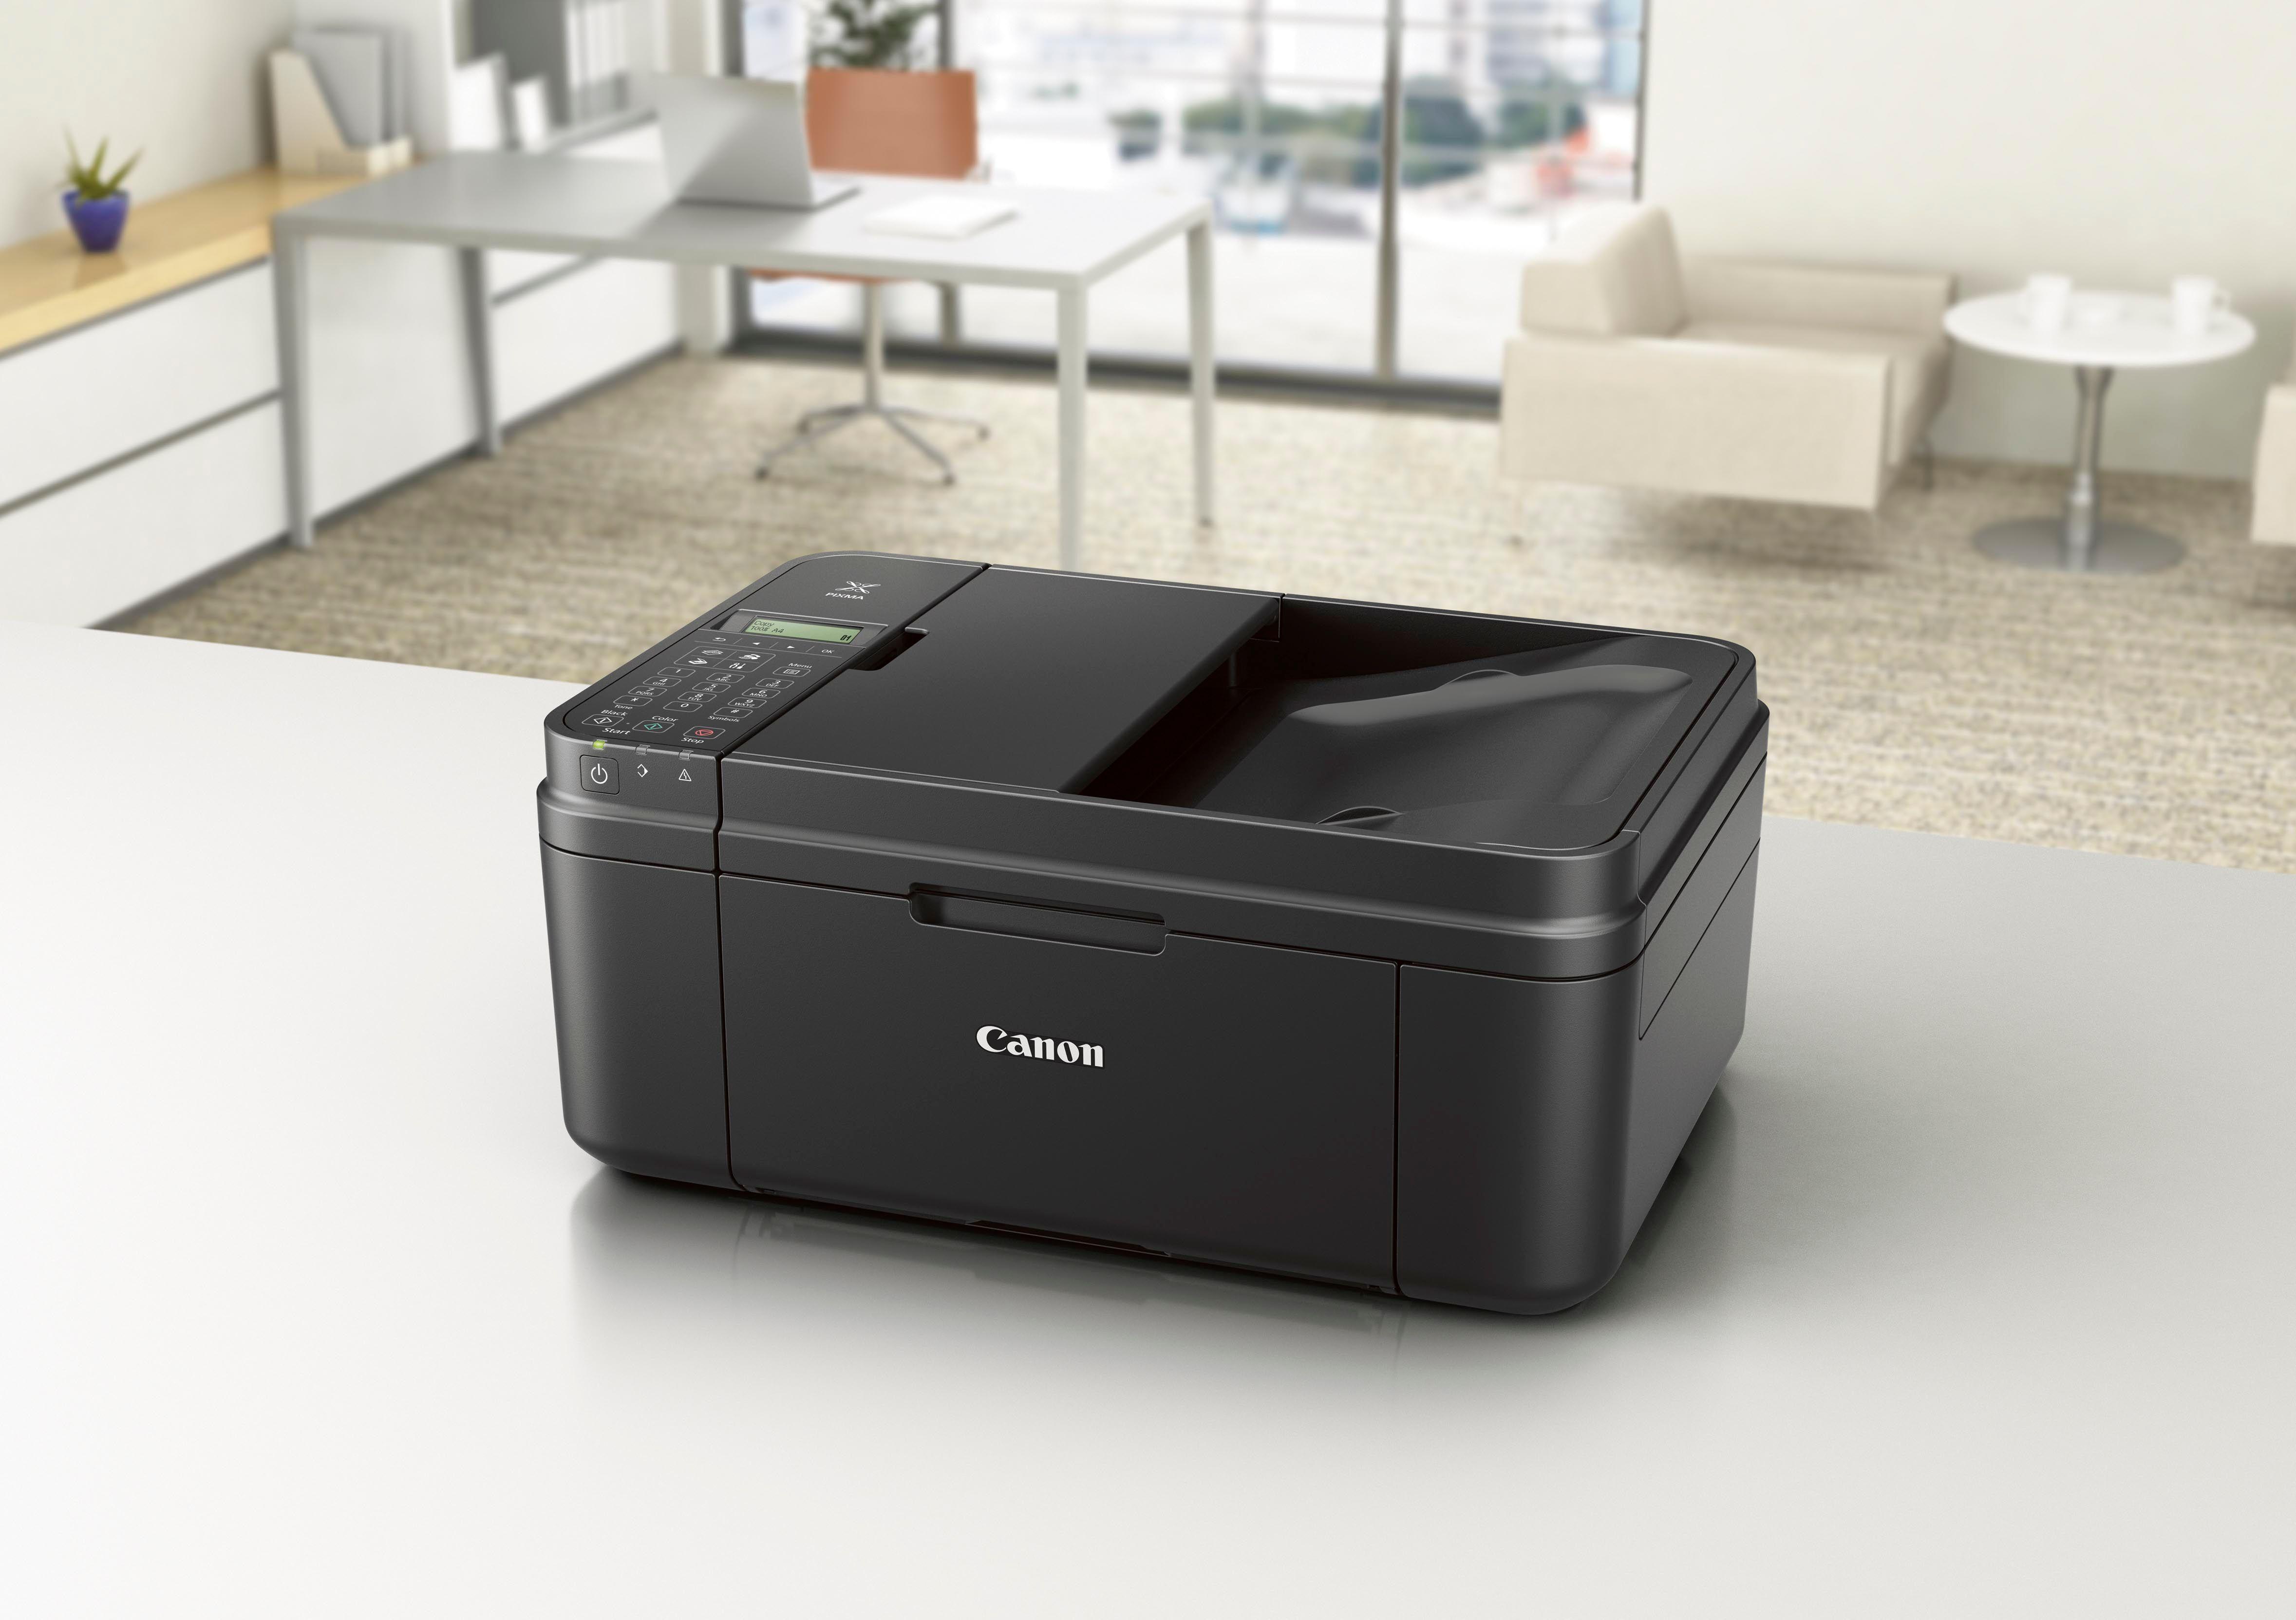 Canon PIXMA All-in-One Printer Scanner Copier Fax Wireless Printing Machine WiFi